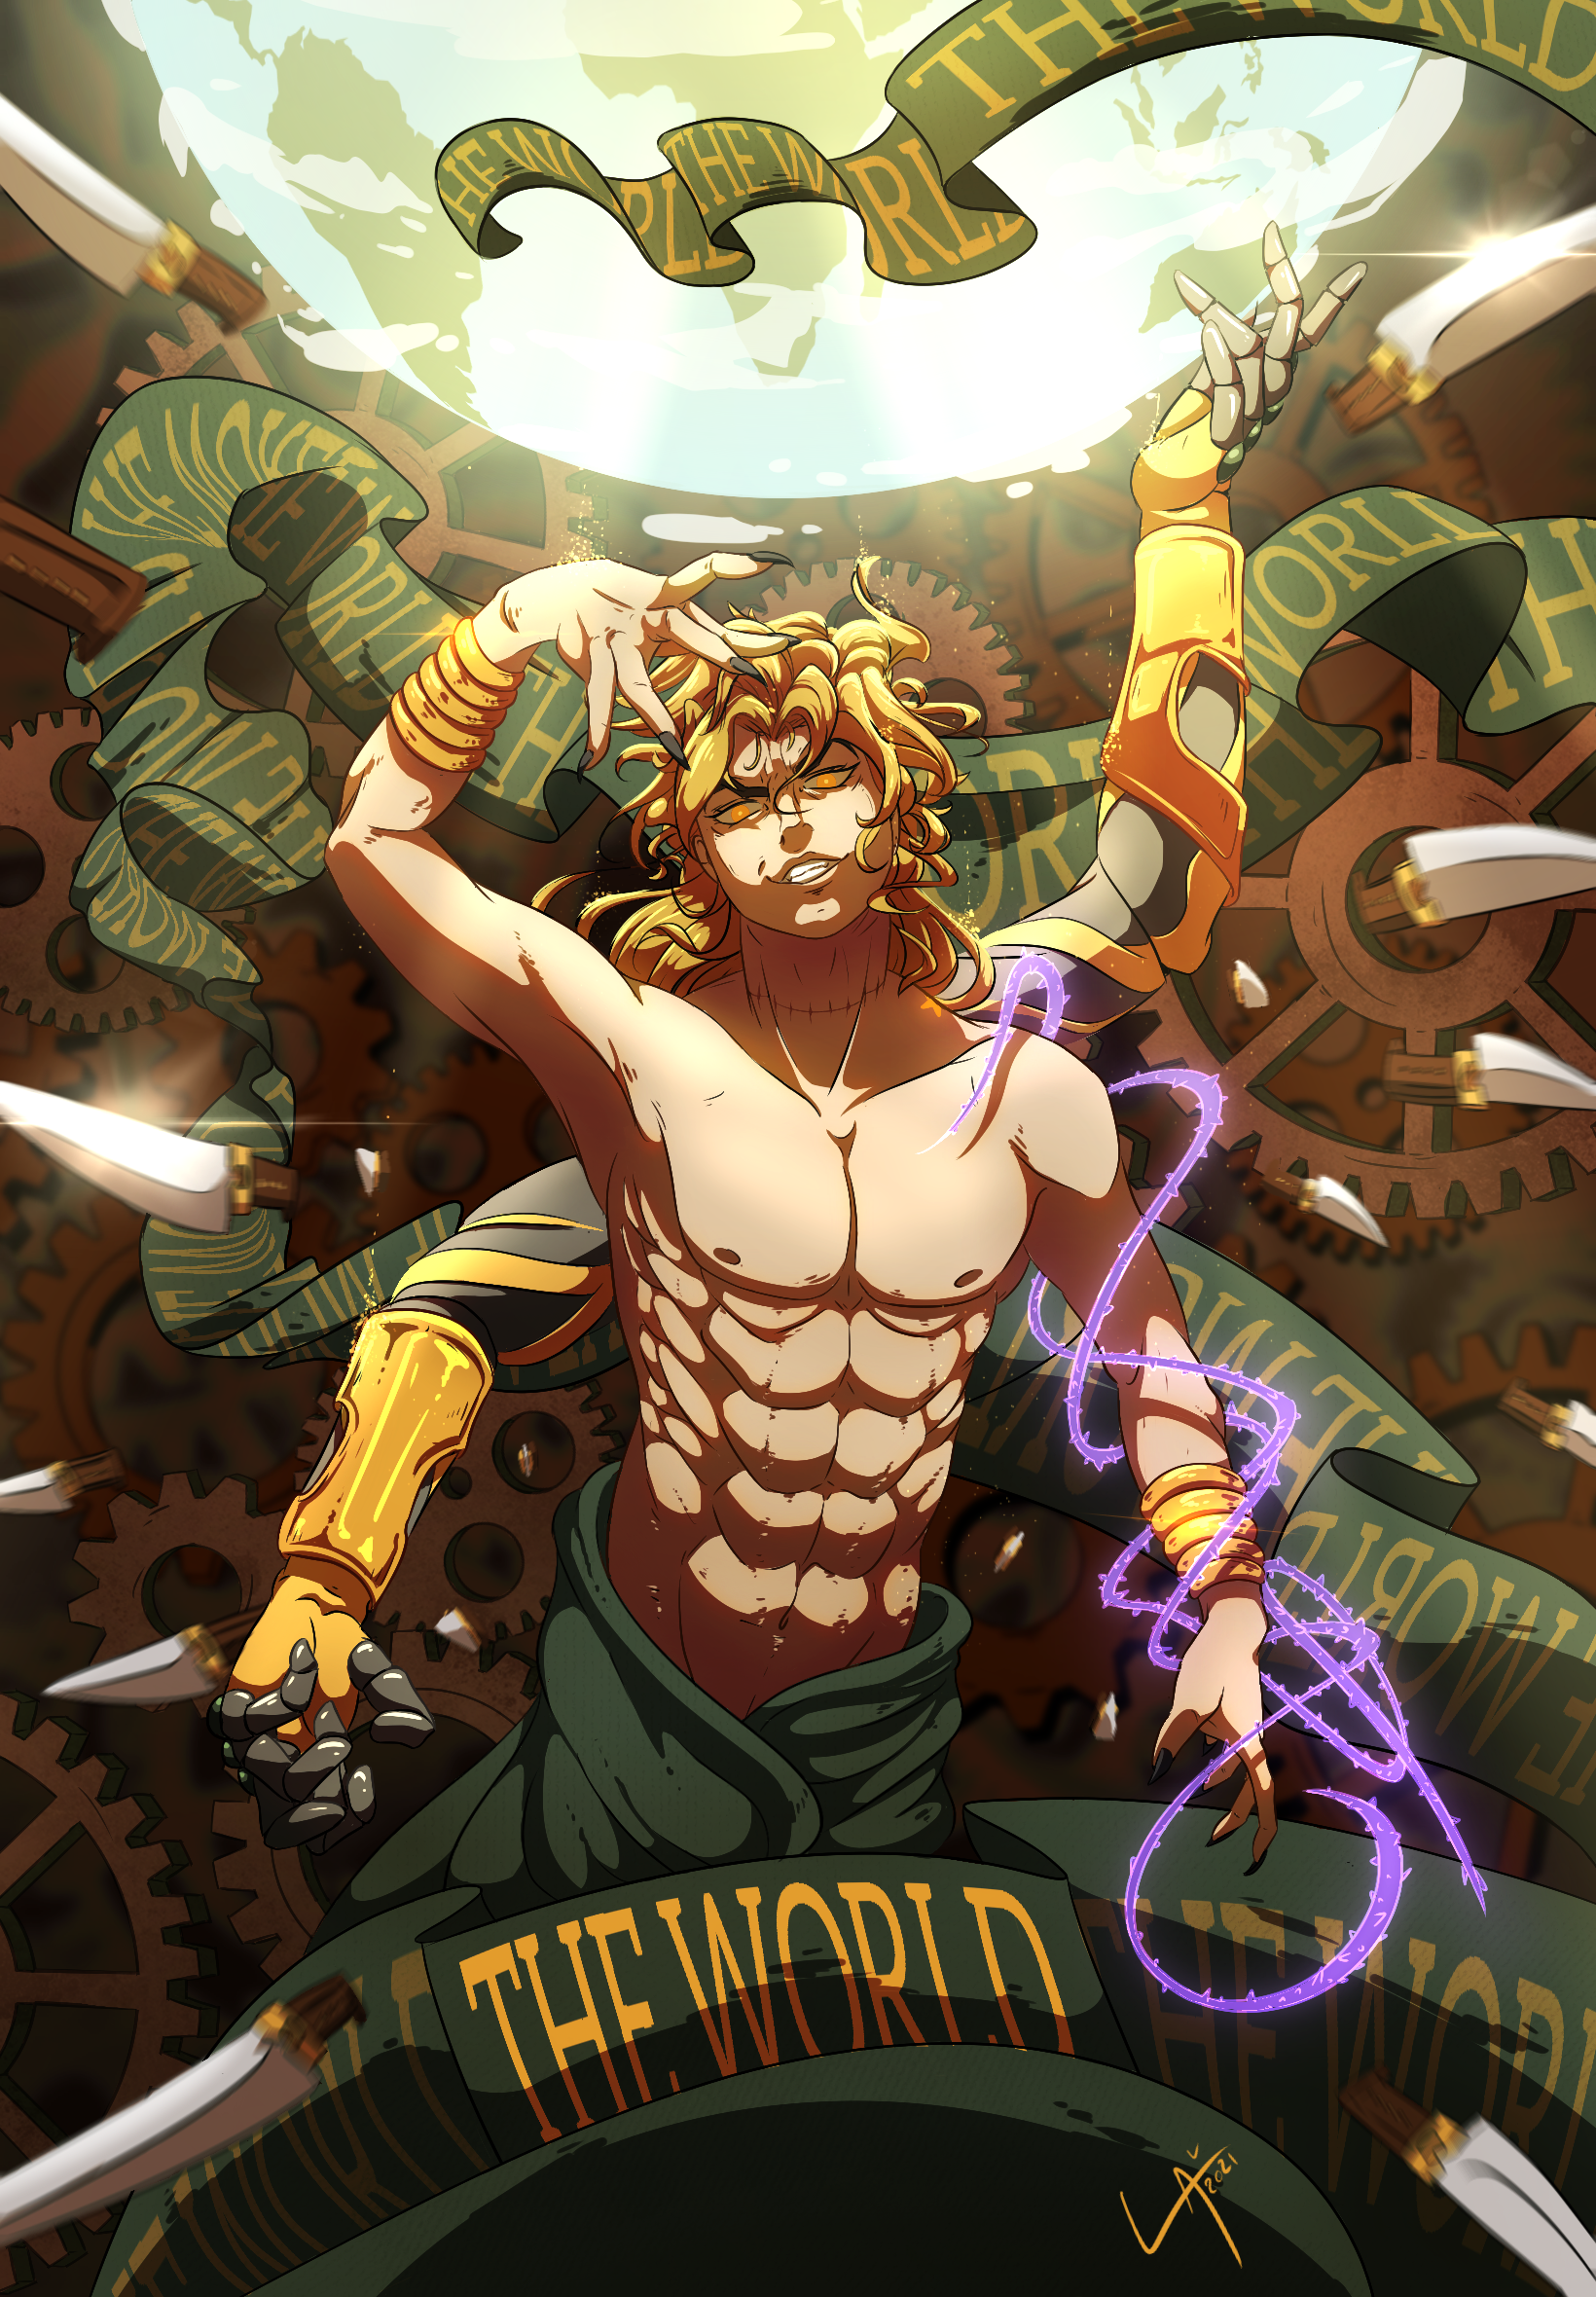 XXI - The World